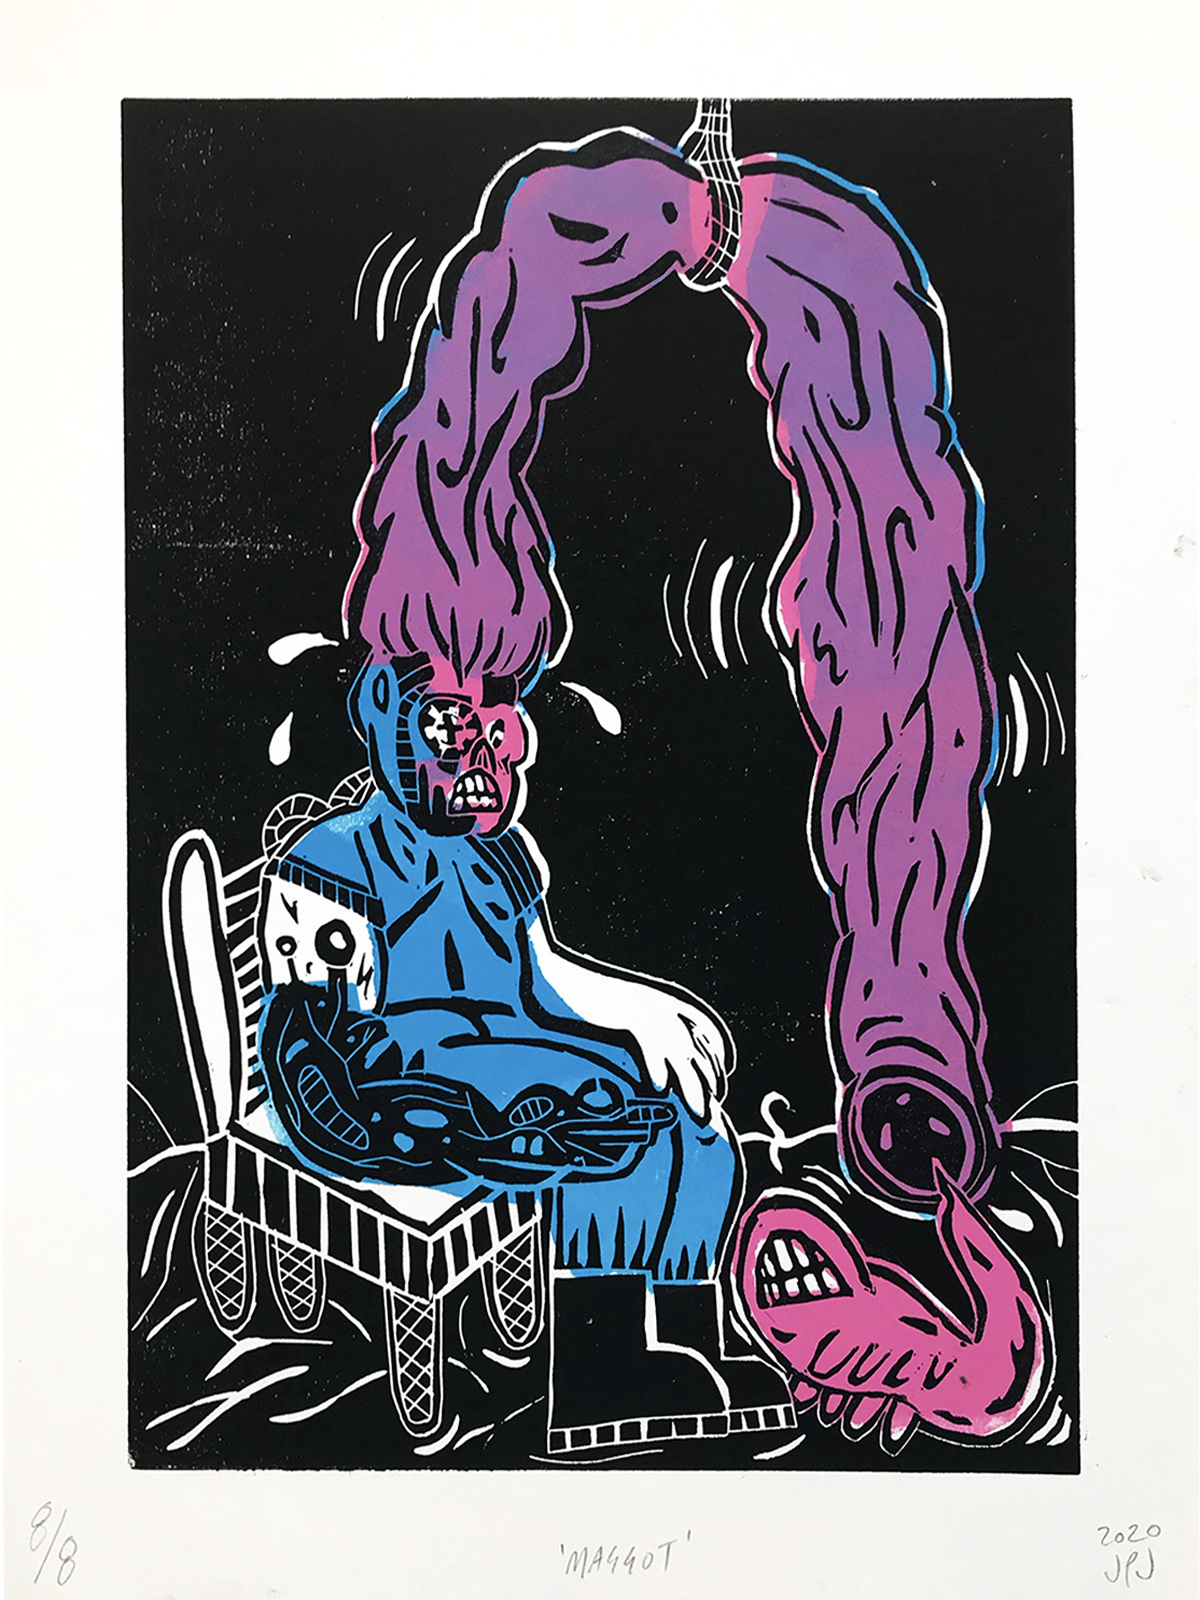 John Powell Jones, Maggot, 2020, Courtesy of IMT Gallery